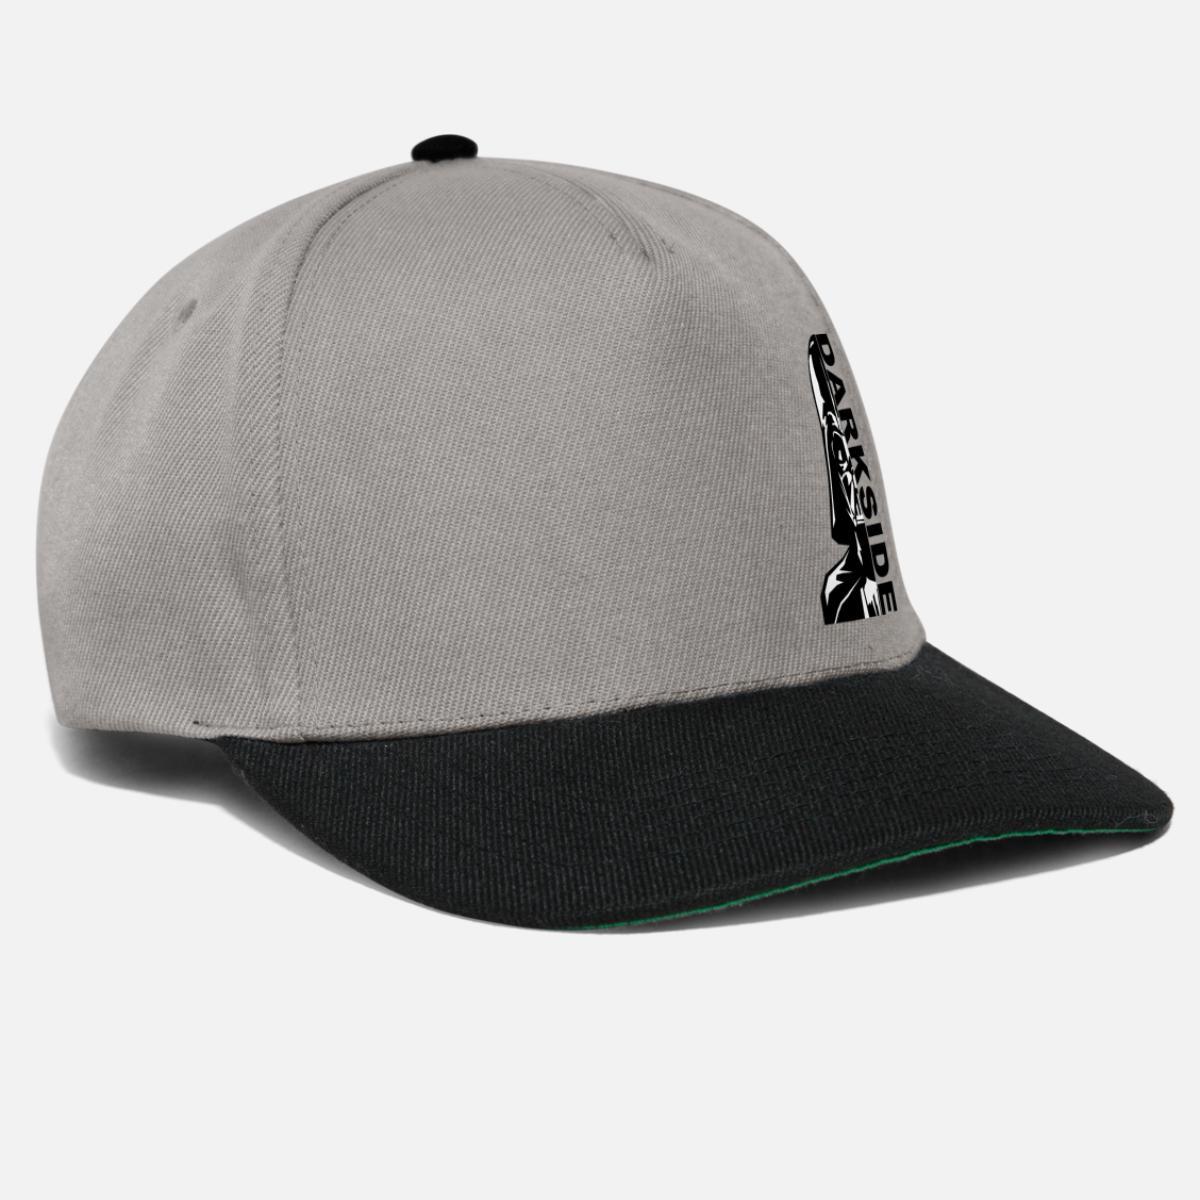 a92fd691eac DARK SIDE Snapback Cap